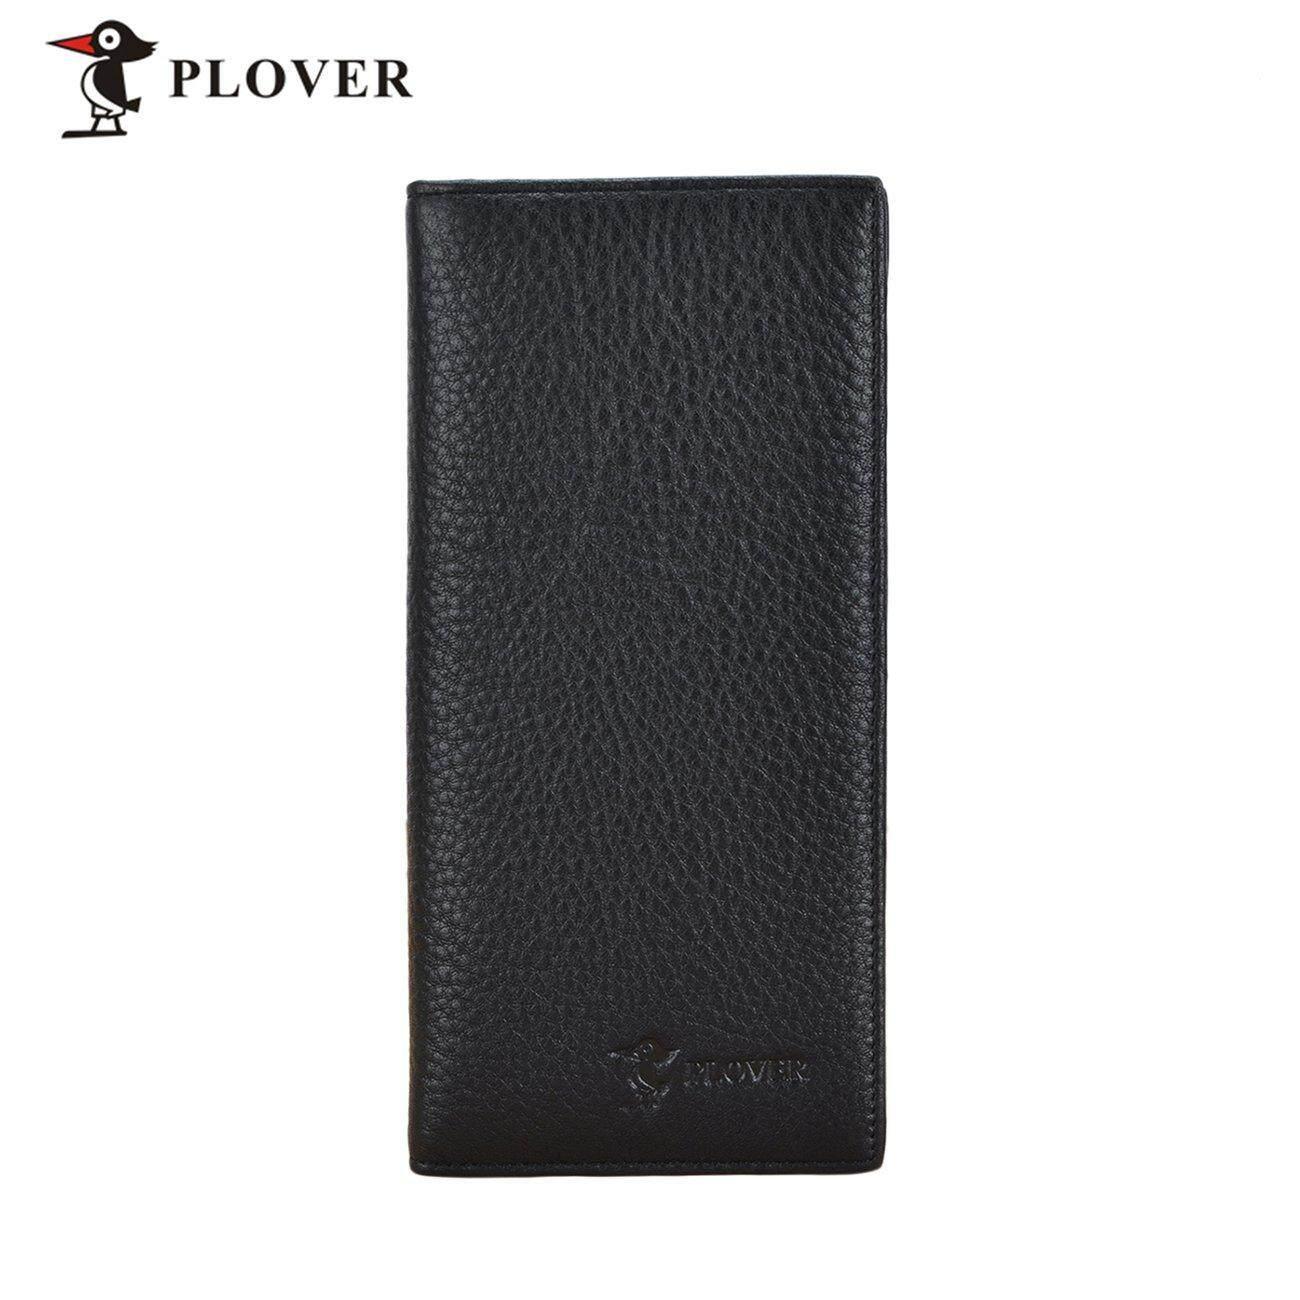 Hot Deals PLOVER GD5919-8A Black Men Long Wallet Cow Leather Solid Slim Long Wallet